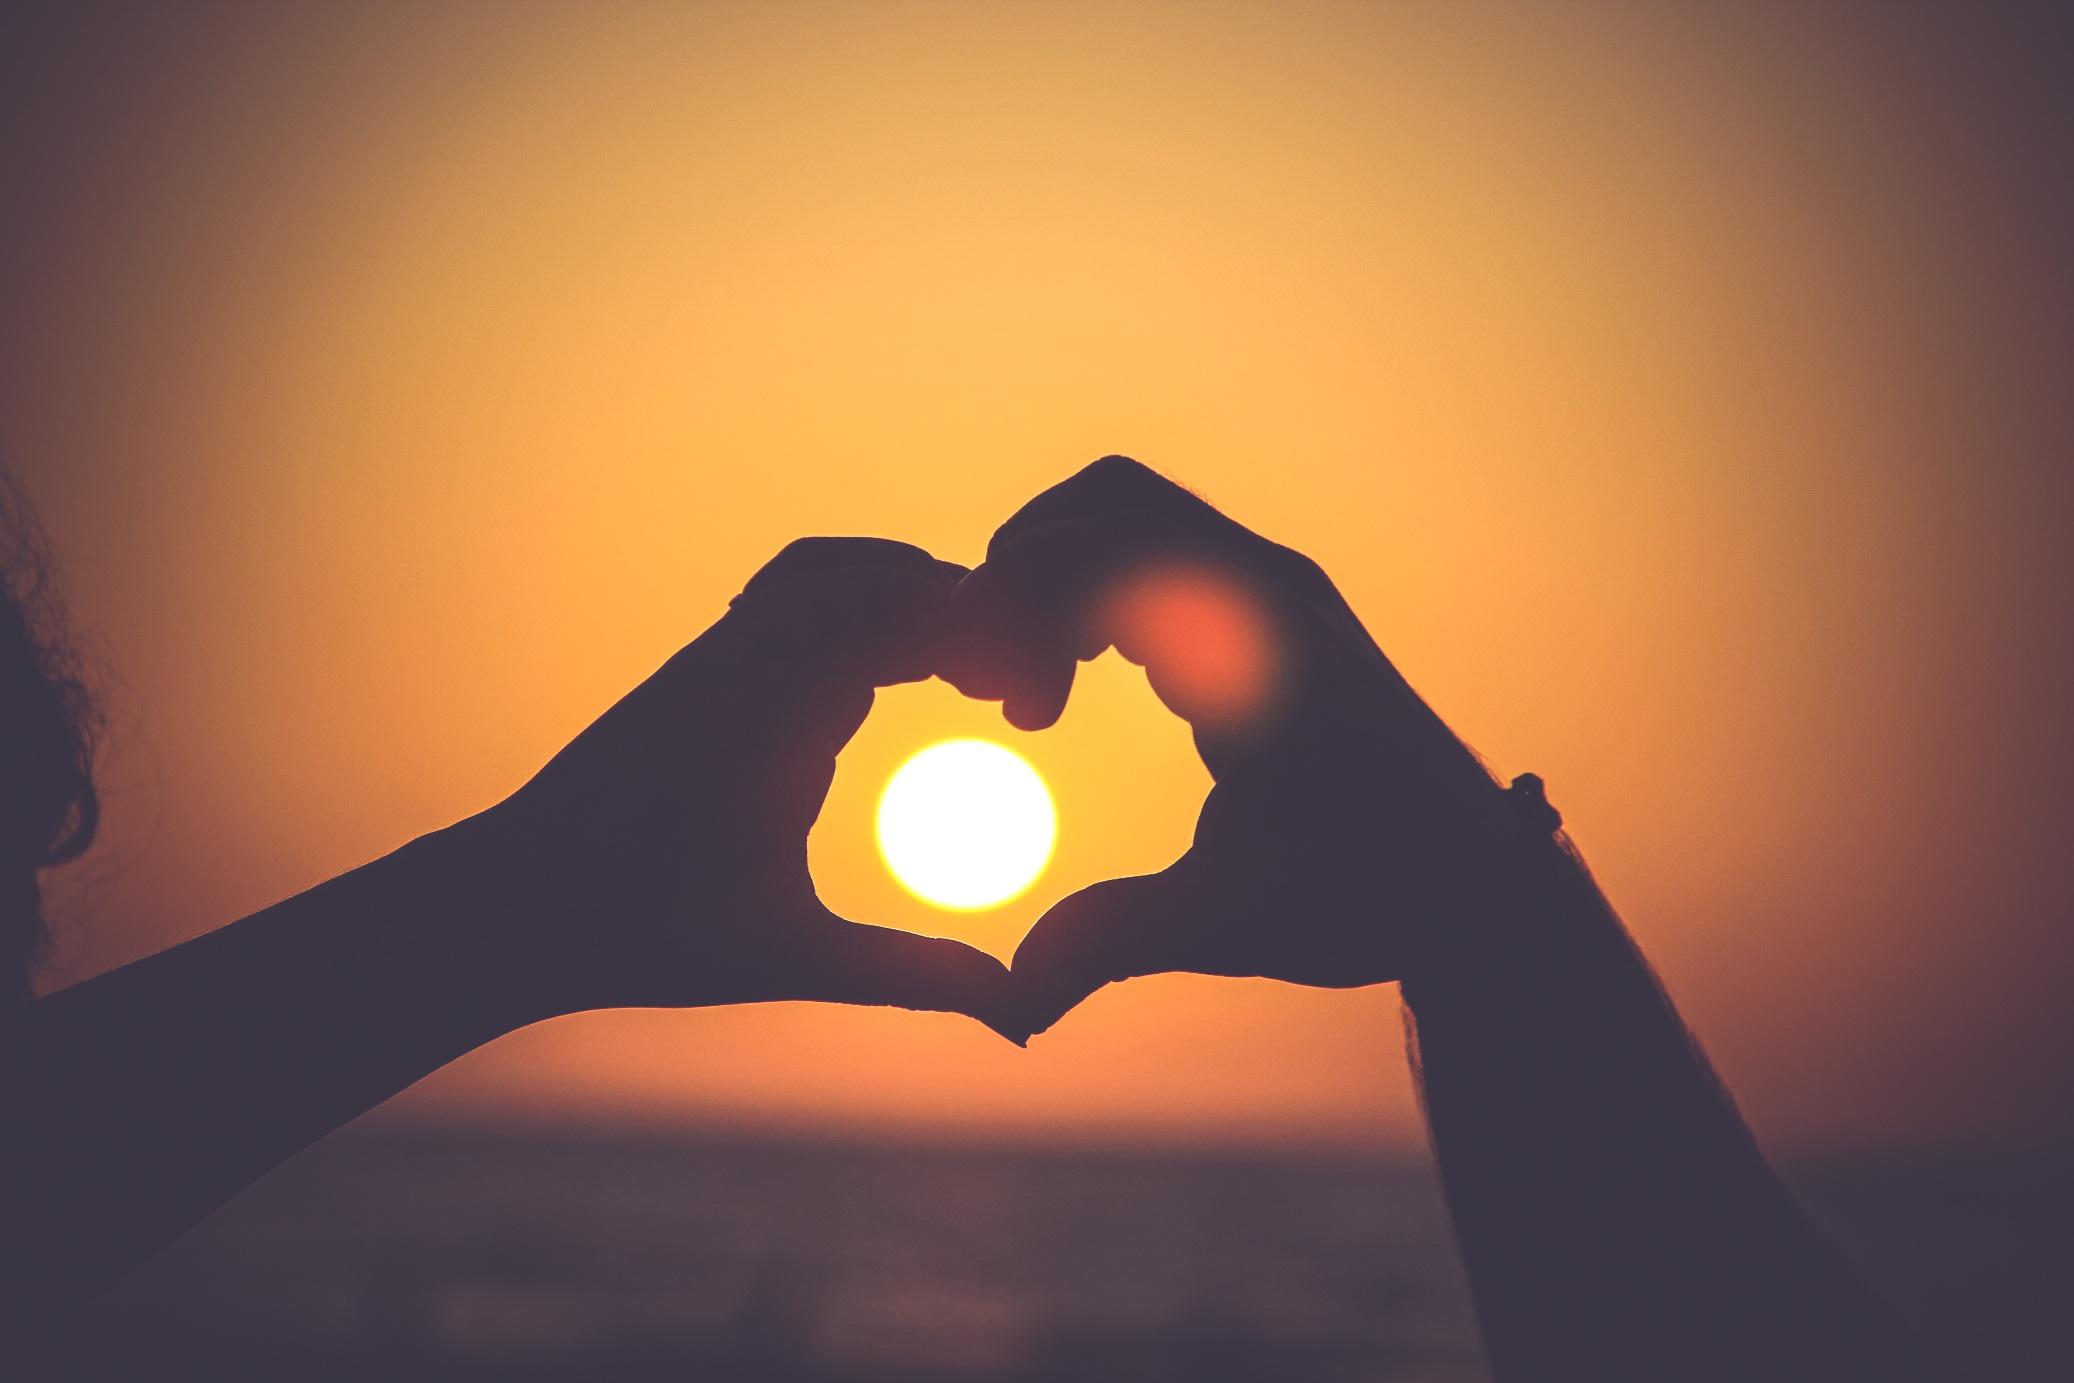 Hands making a heart in front of a sun from Unsplash.com - https://unsplash.com/mayurgala